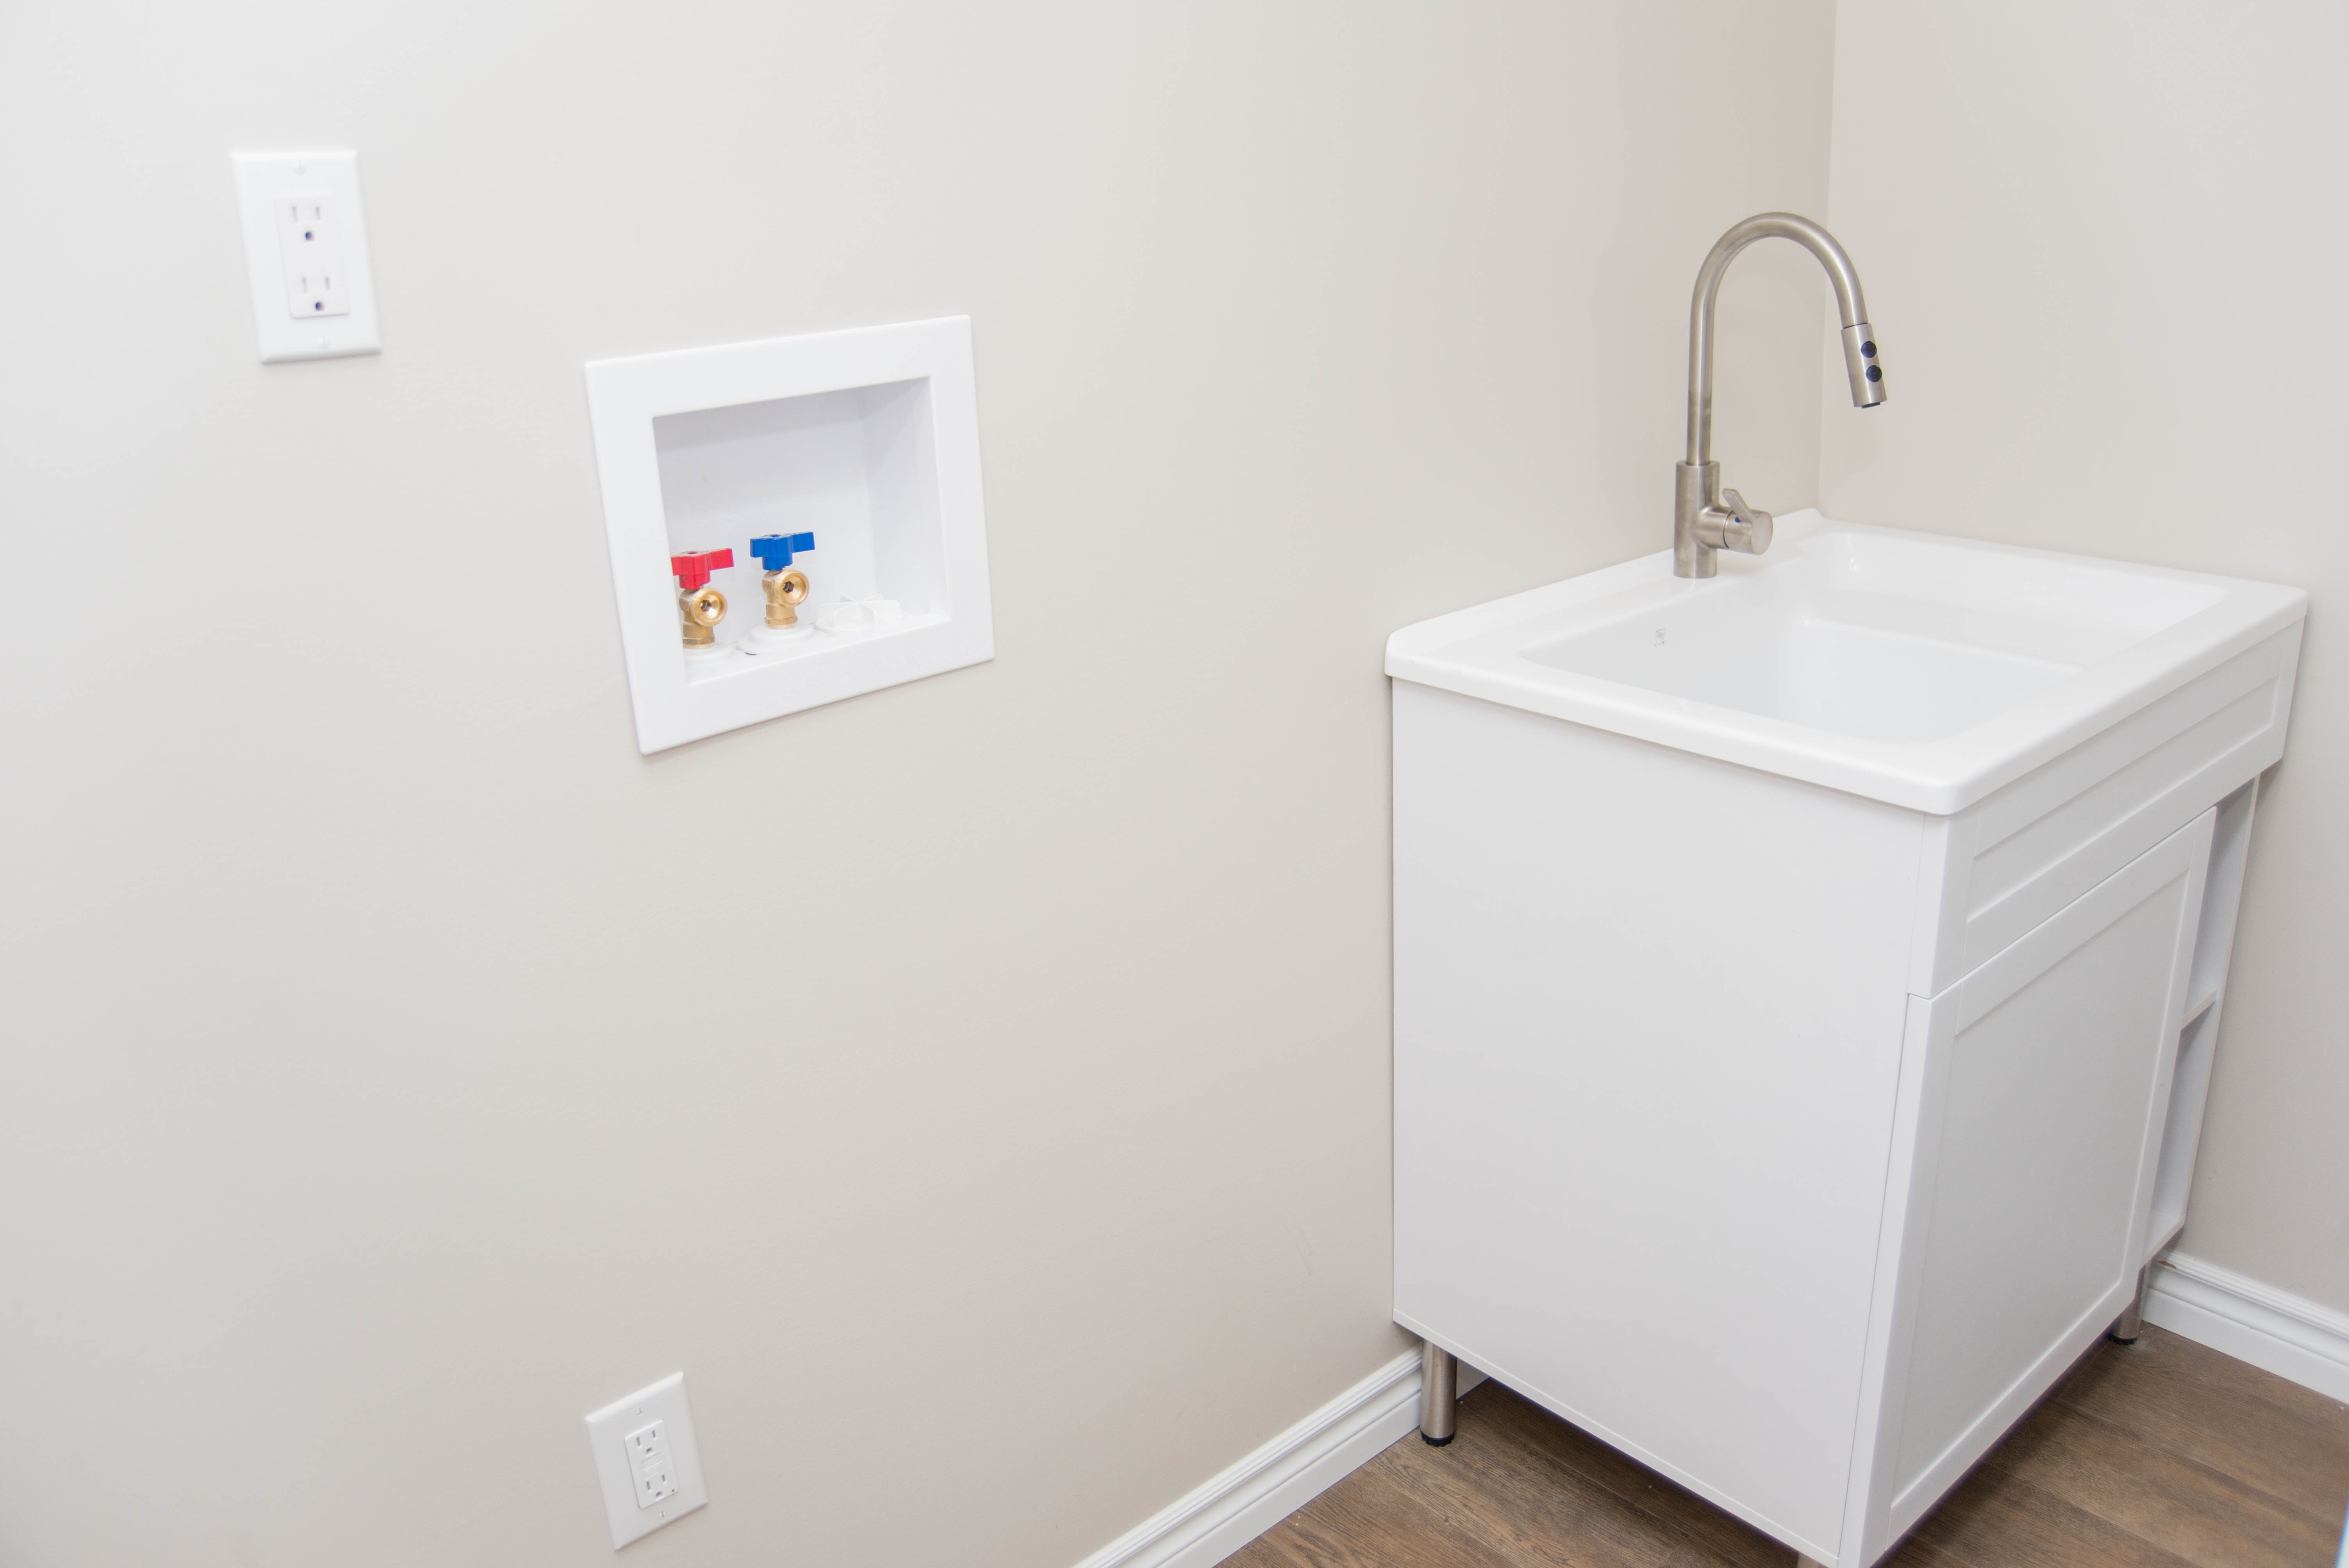 3 Bedroom - Washer/Dryer Hookup